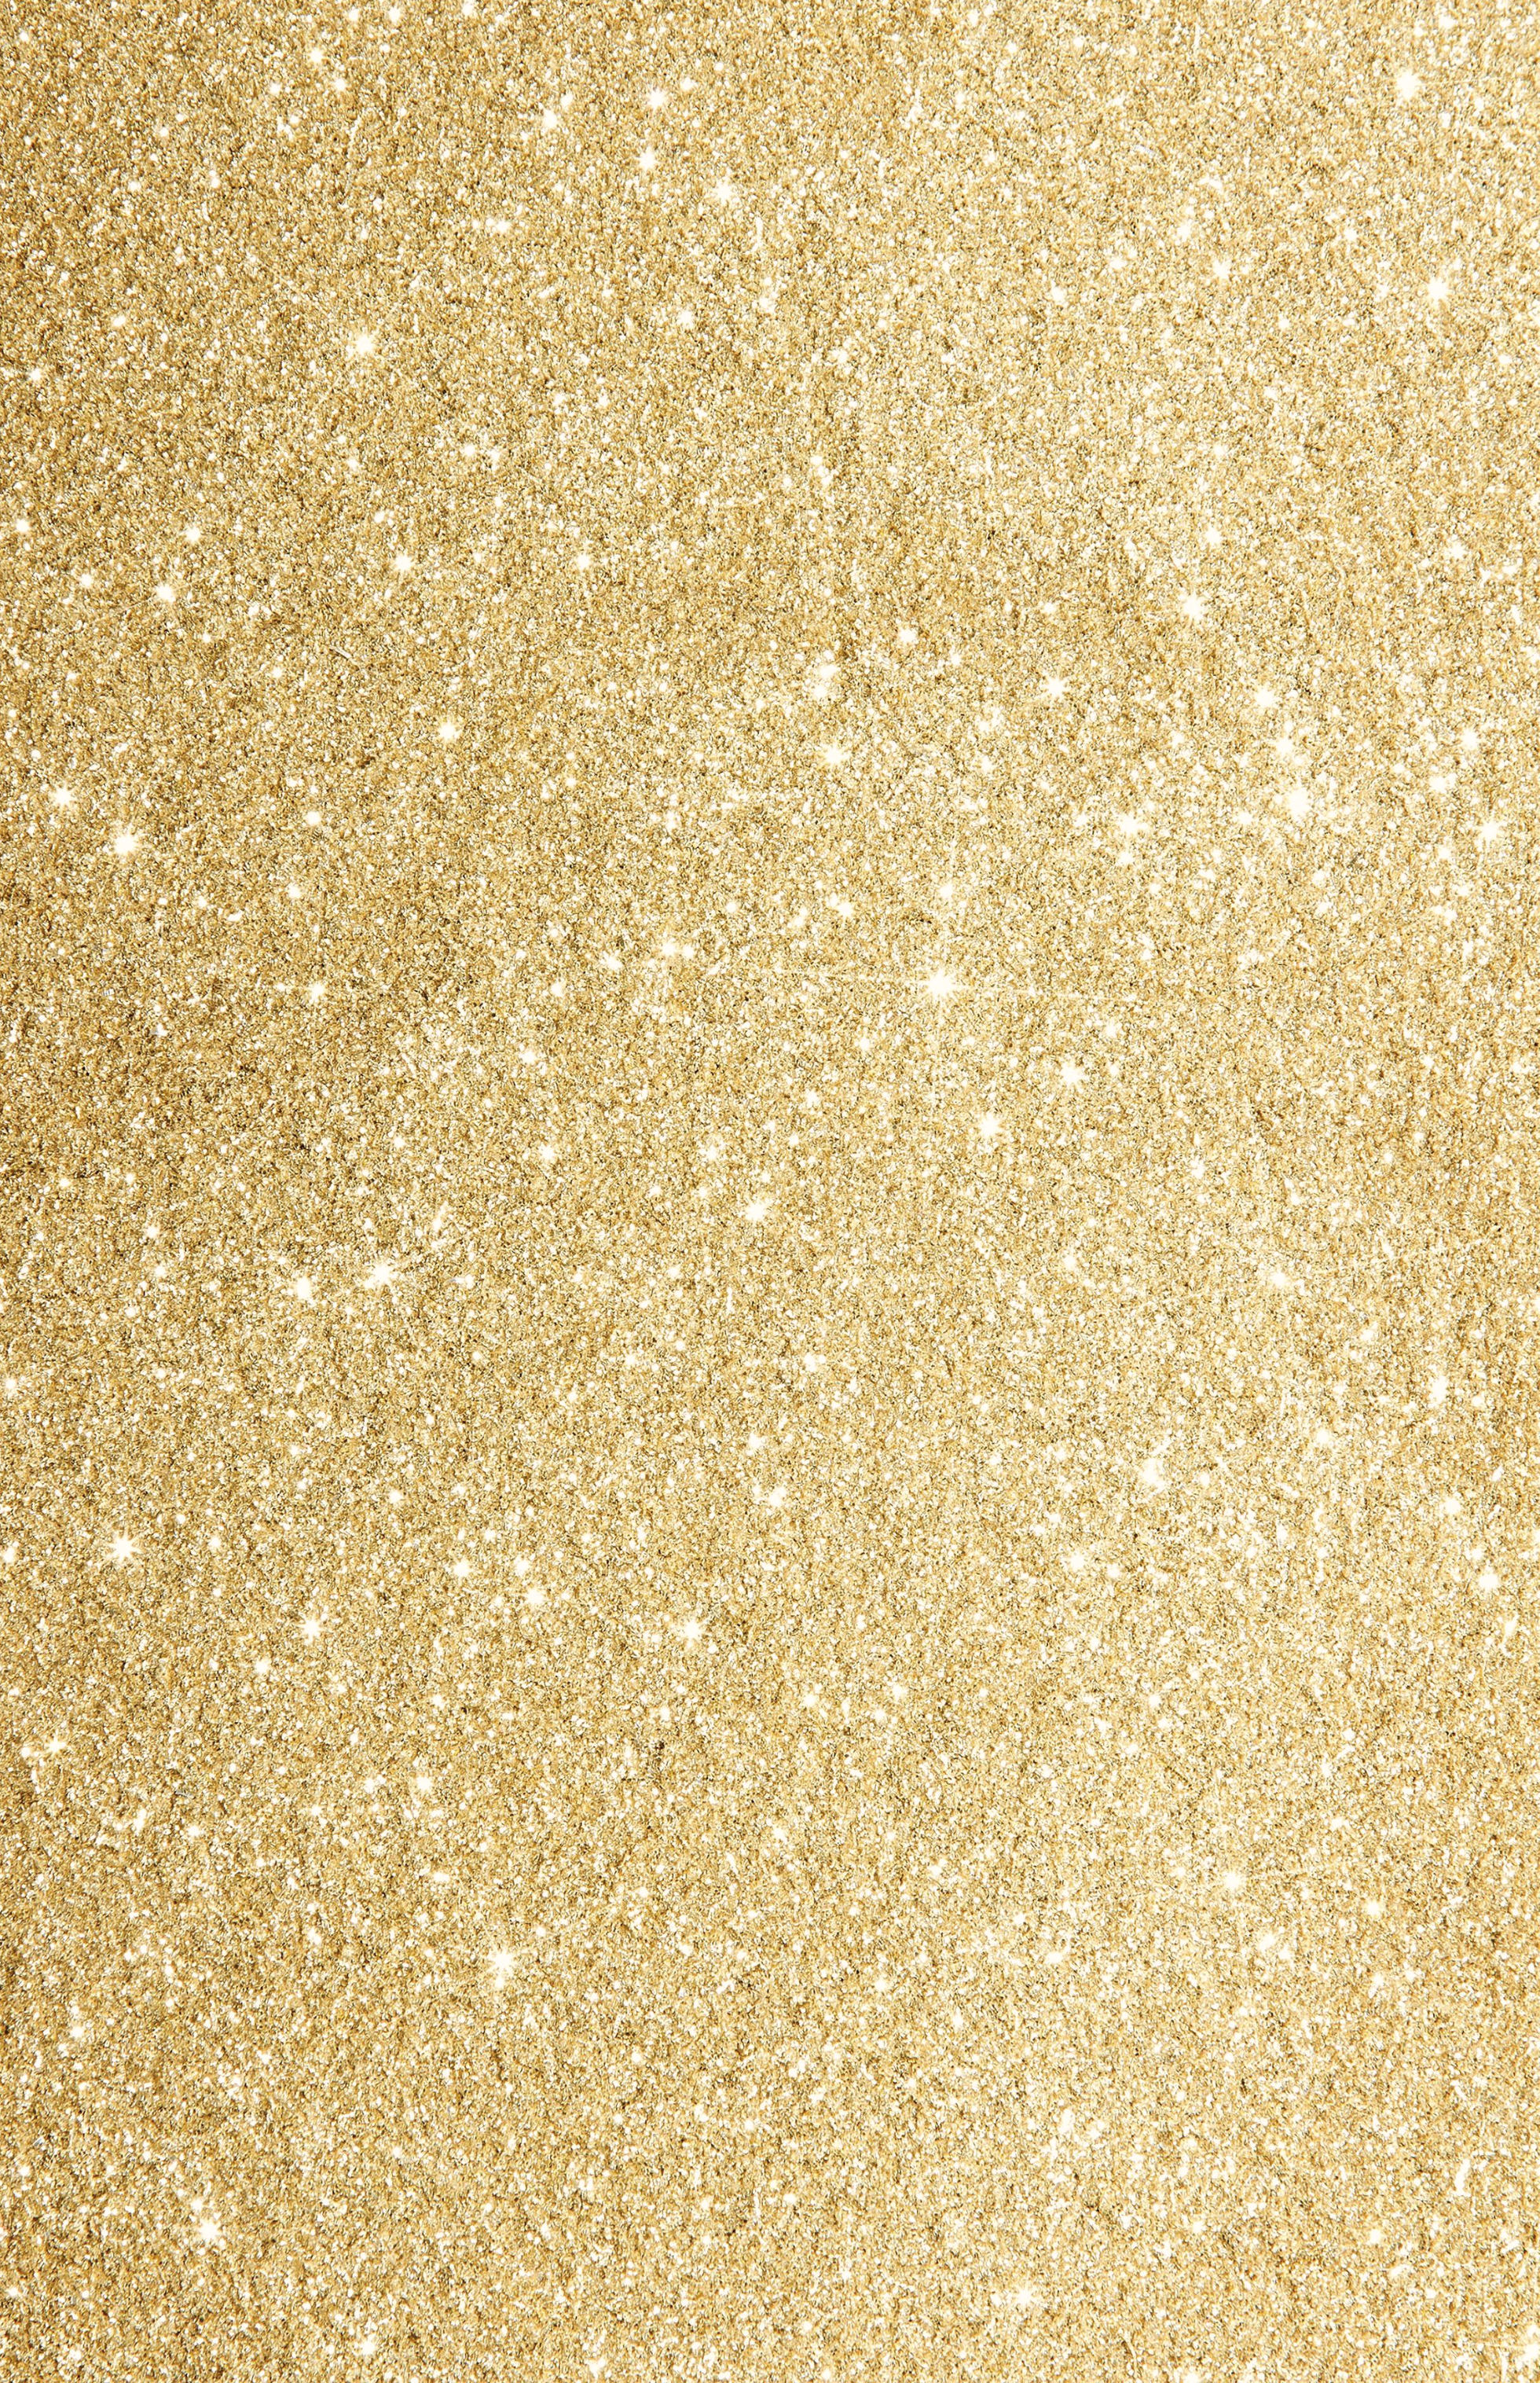 metallic foil damask wallpaper